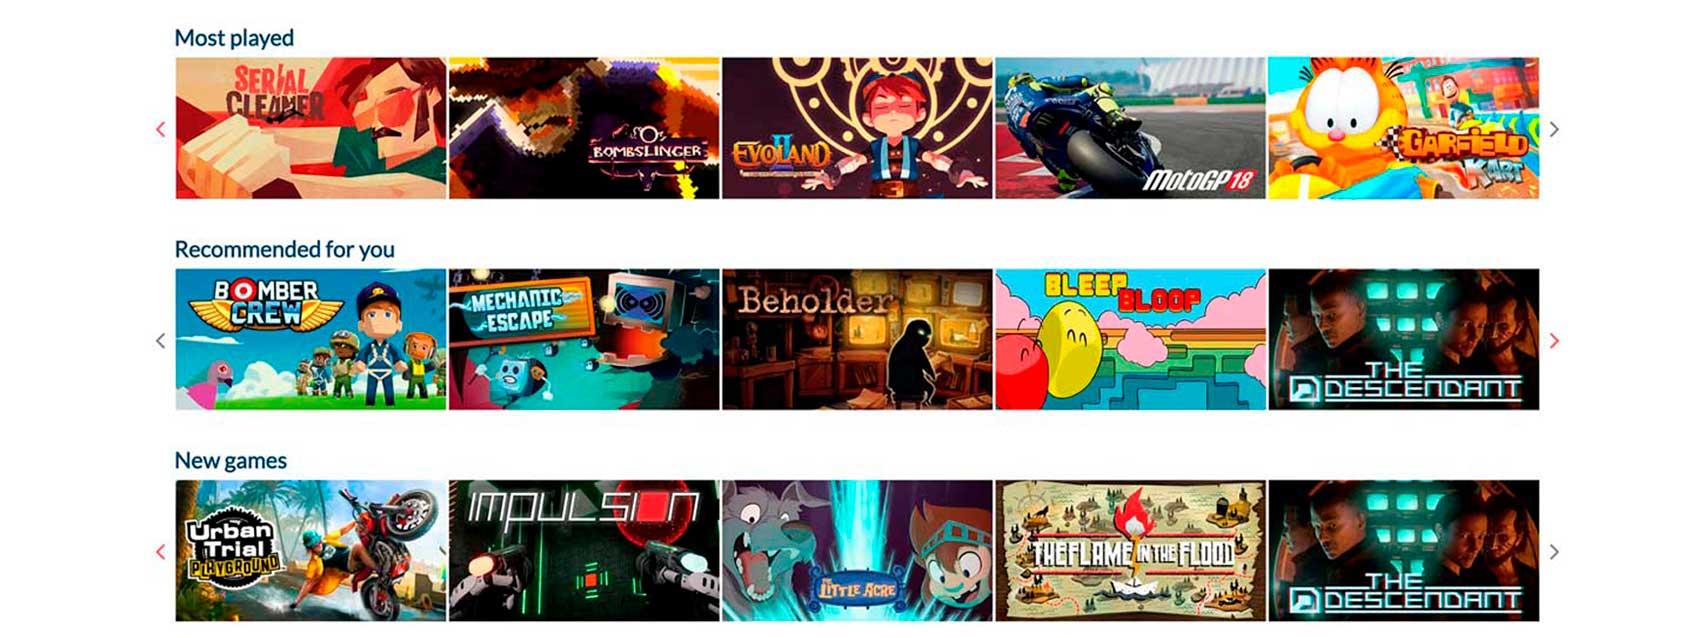 games-platform